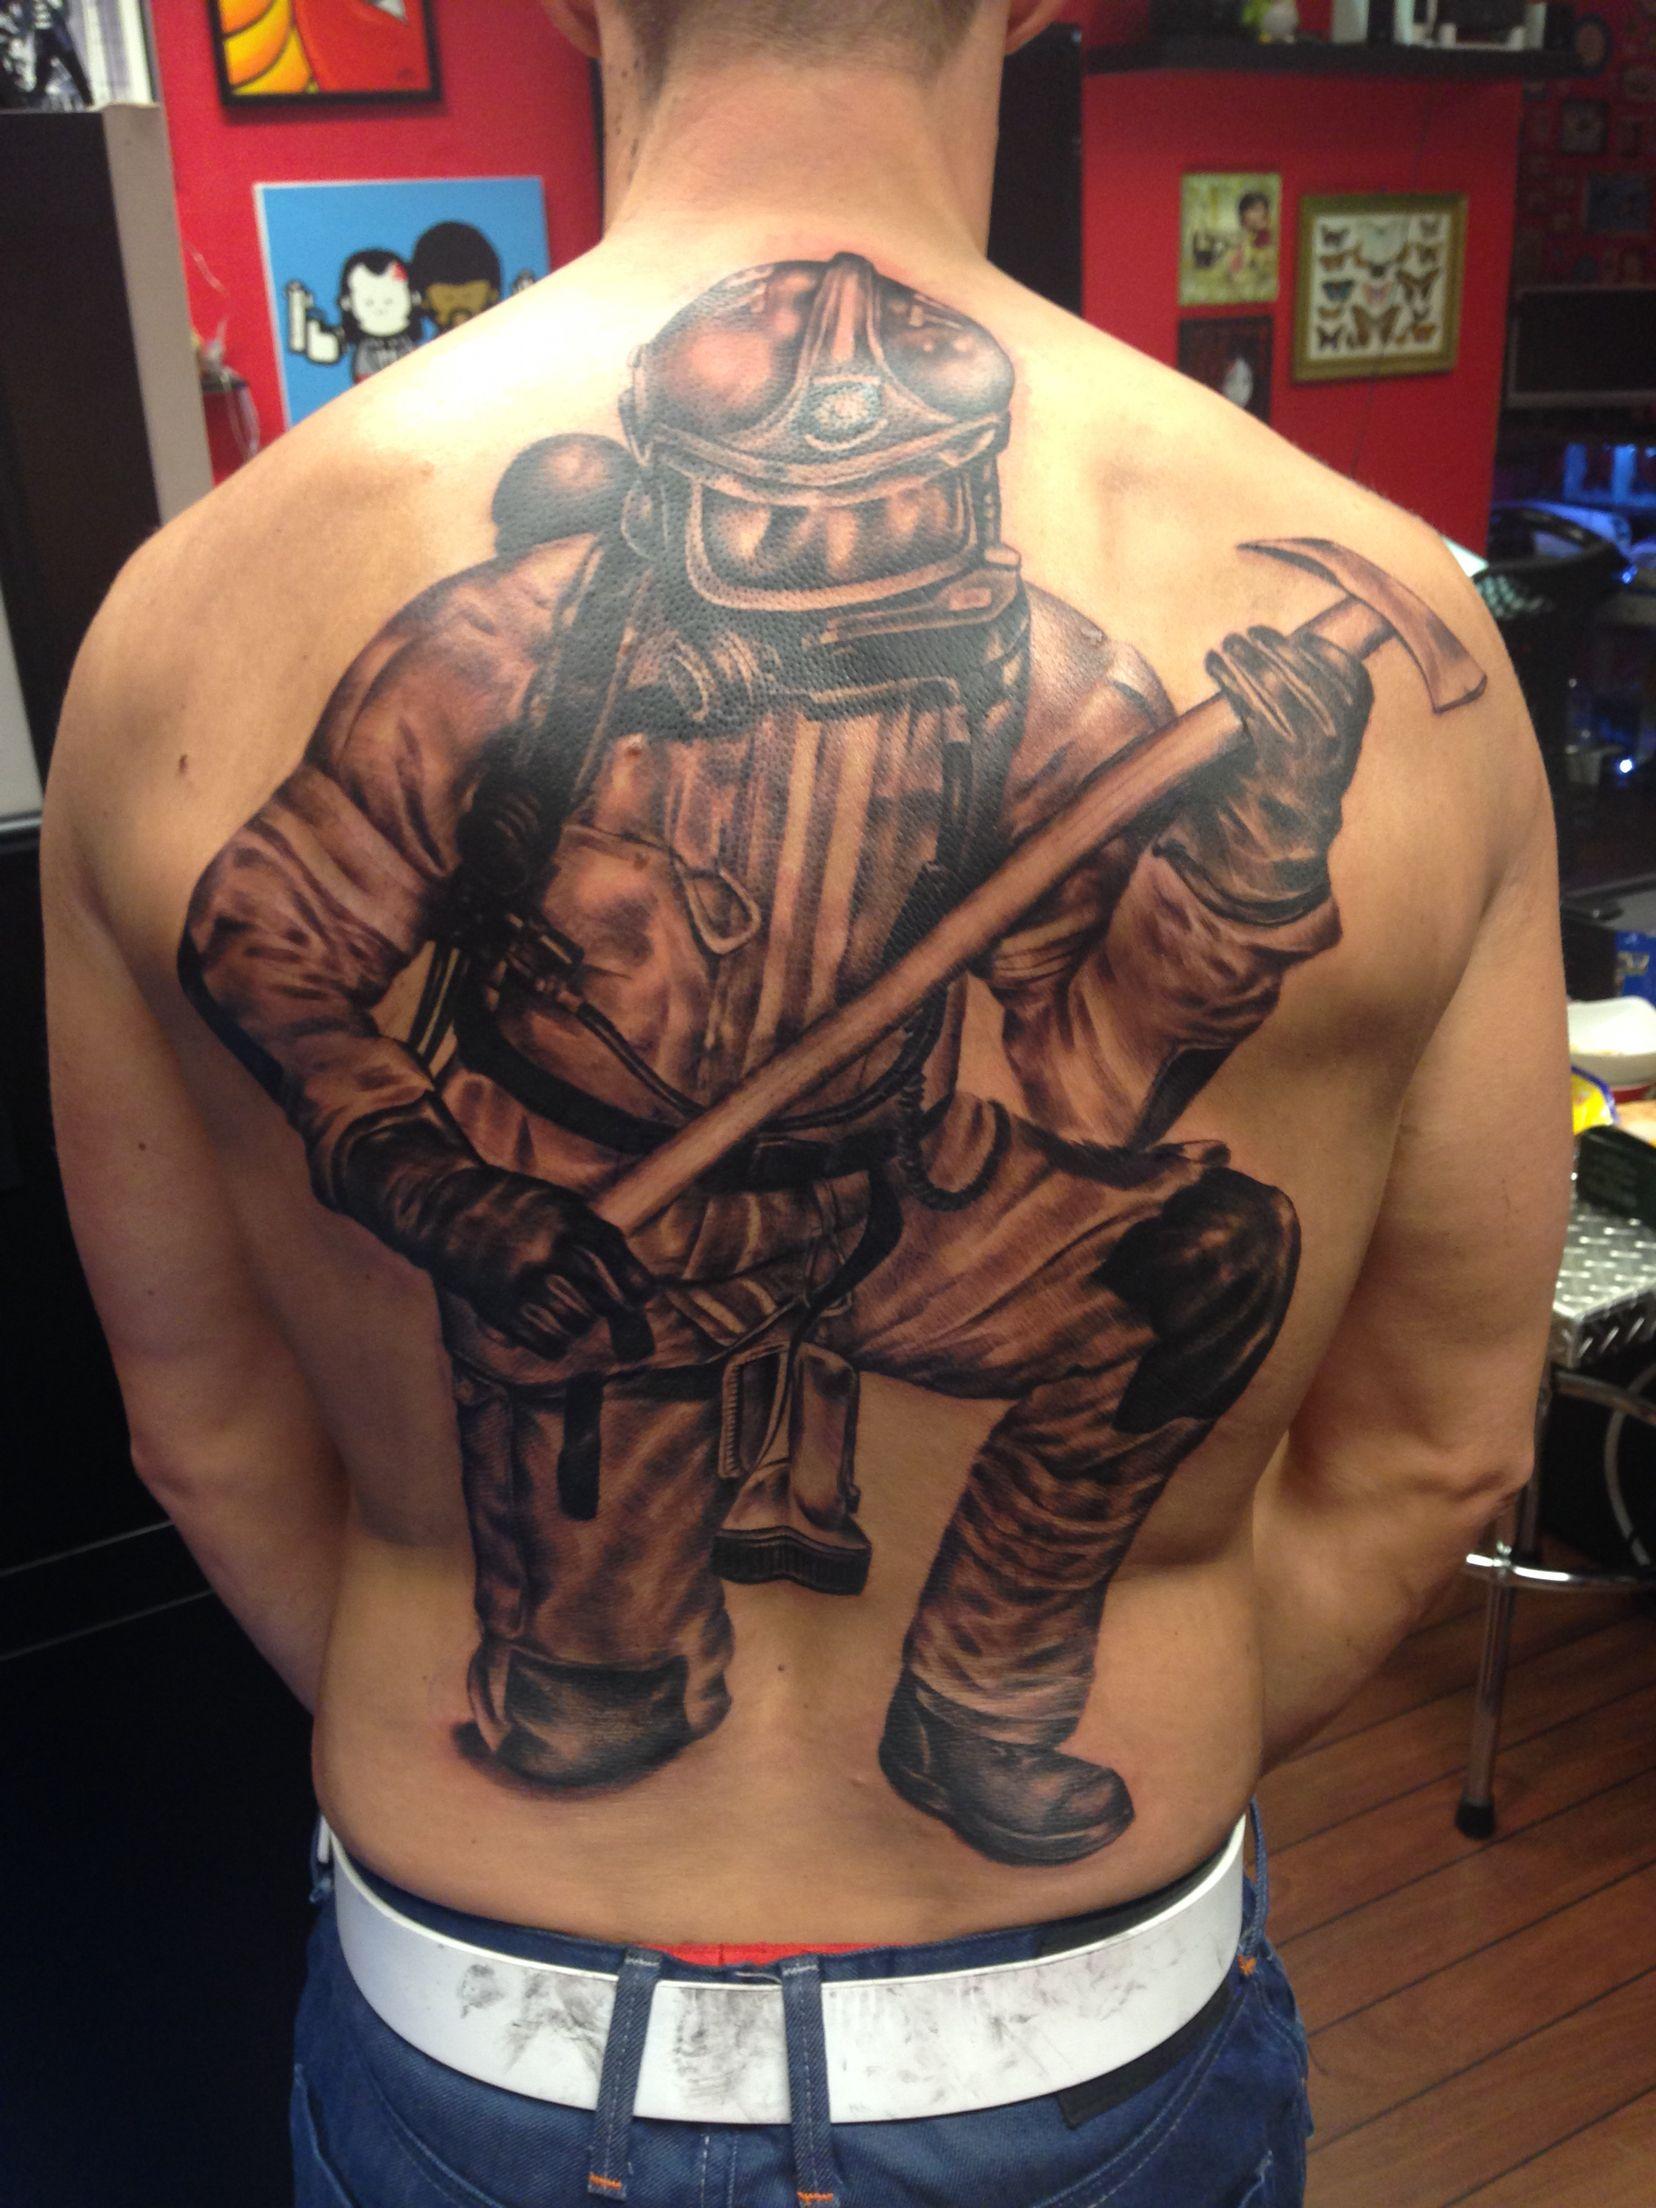 Fi fireman tattoo designs - Norwegian Firefighter Tattoo